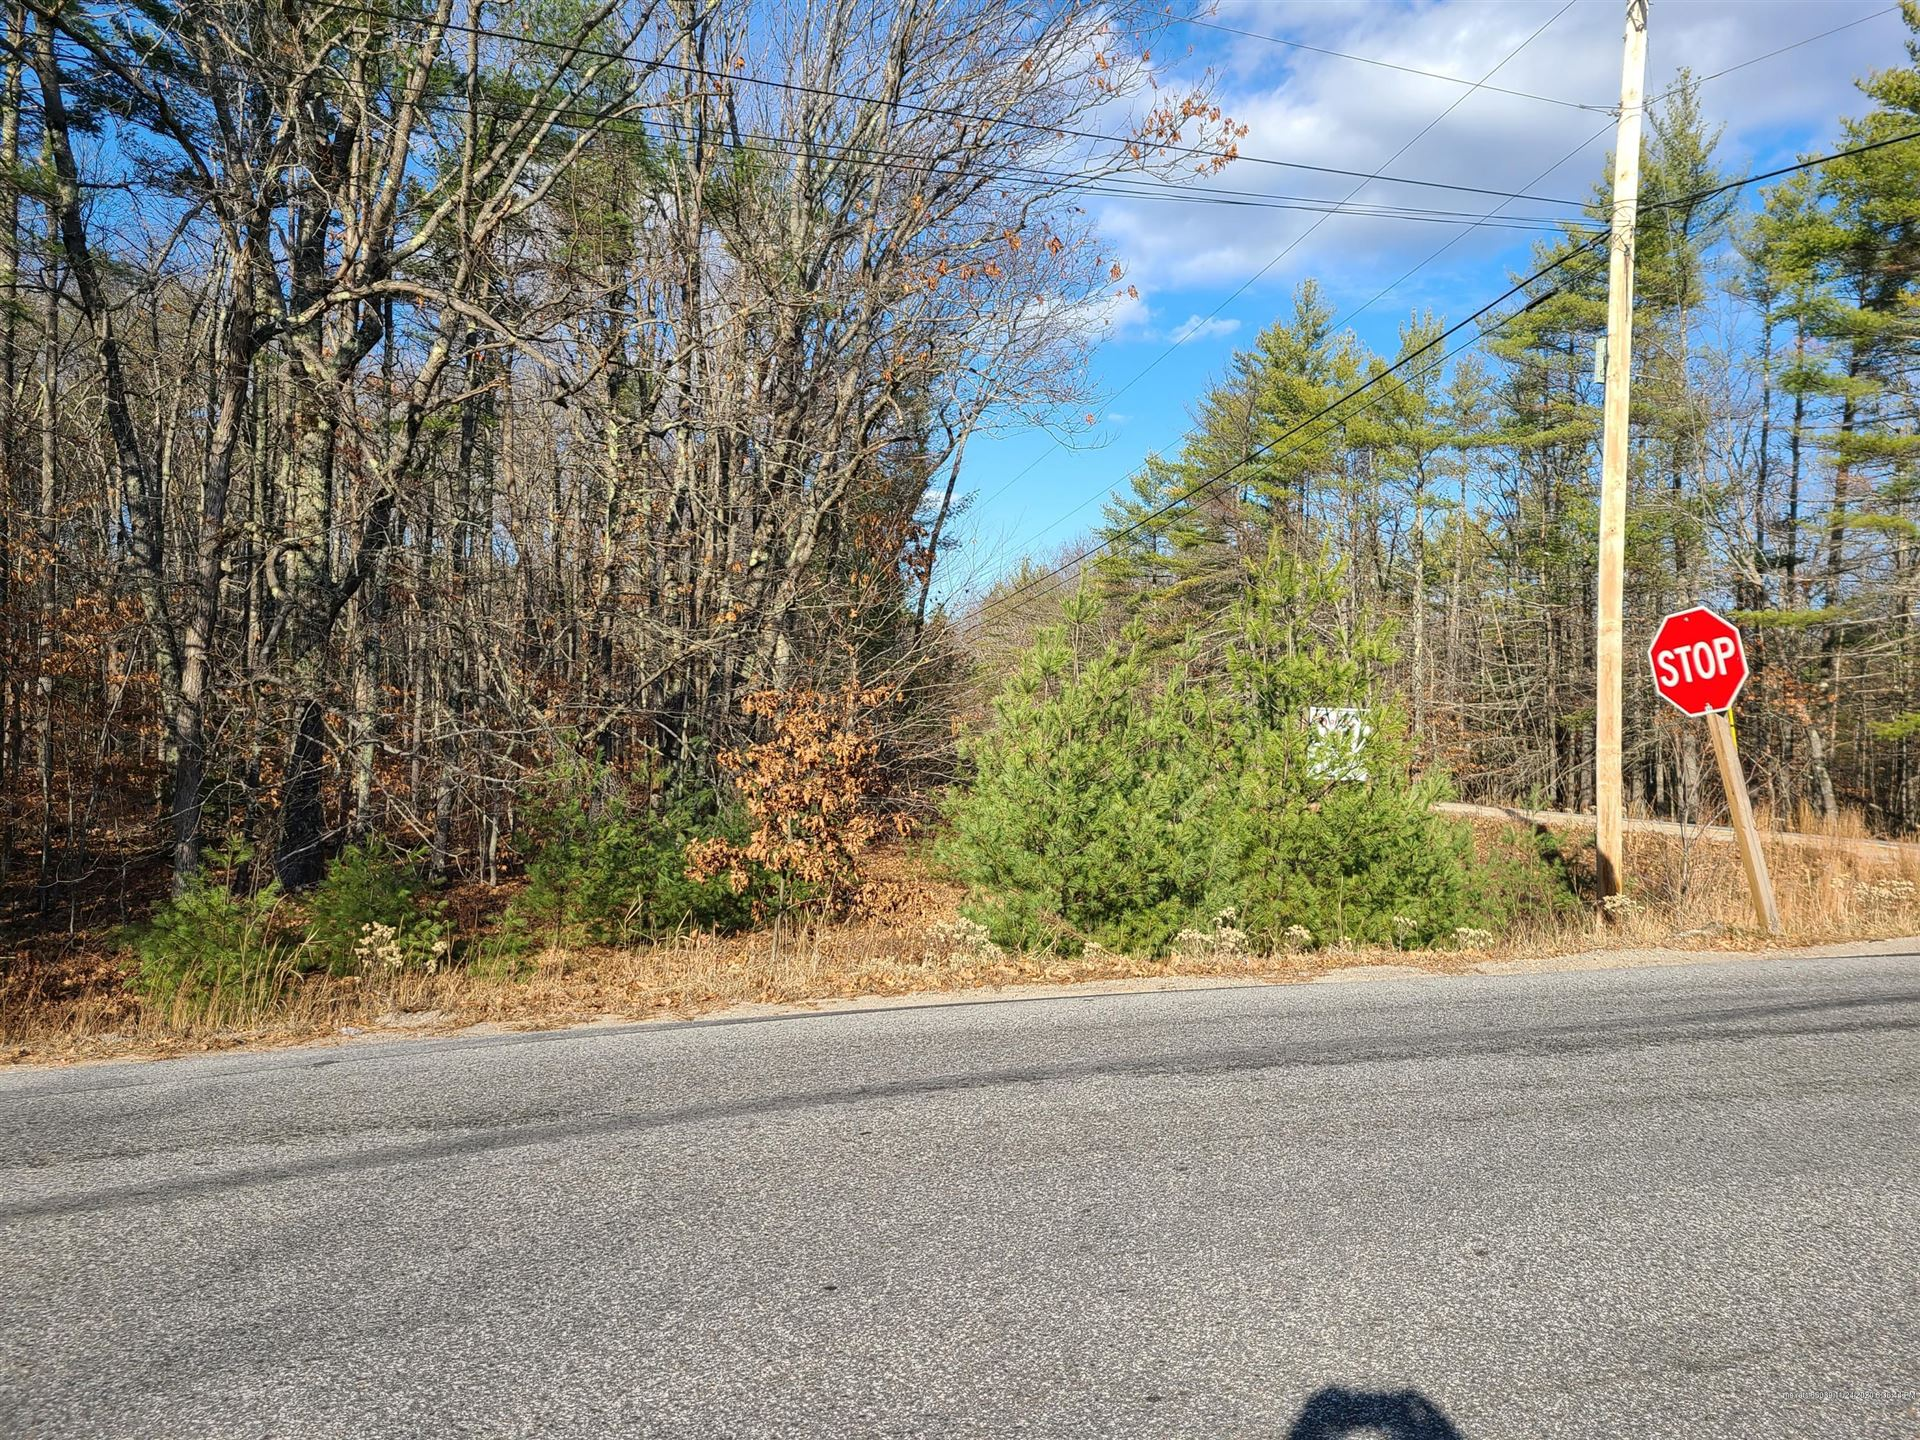 Photo of 5 Doles Ridge Road, Limington, ME 04049 (MLS # 1476786)